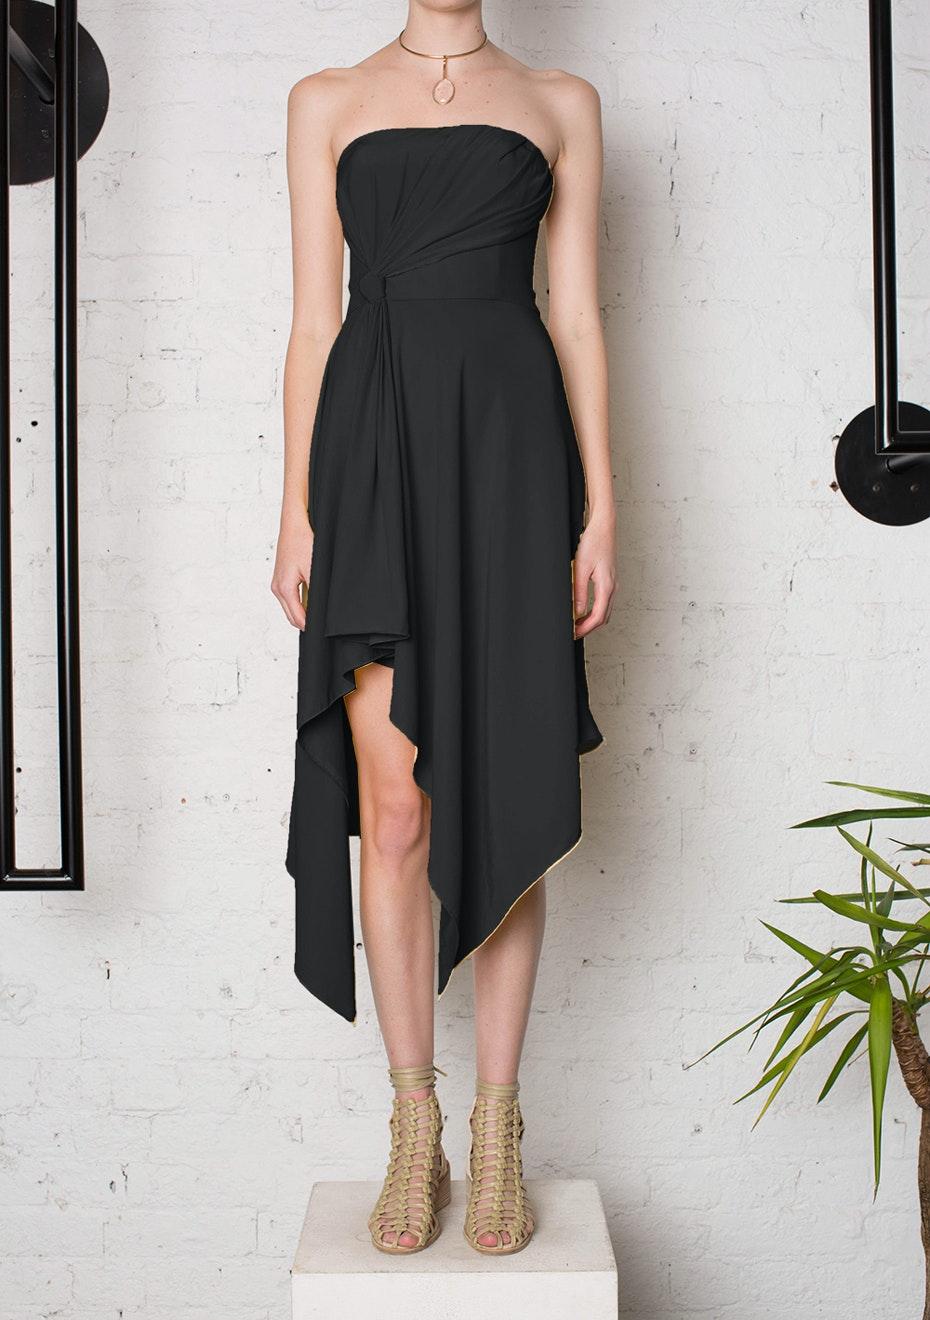 KITX - Honest One Strapless Dress Silk- Black